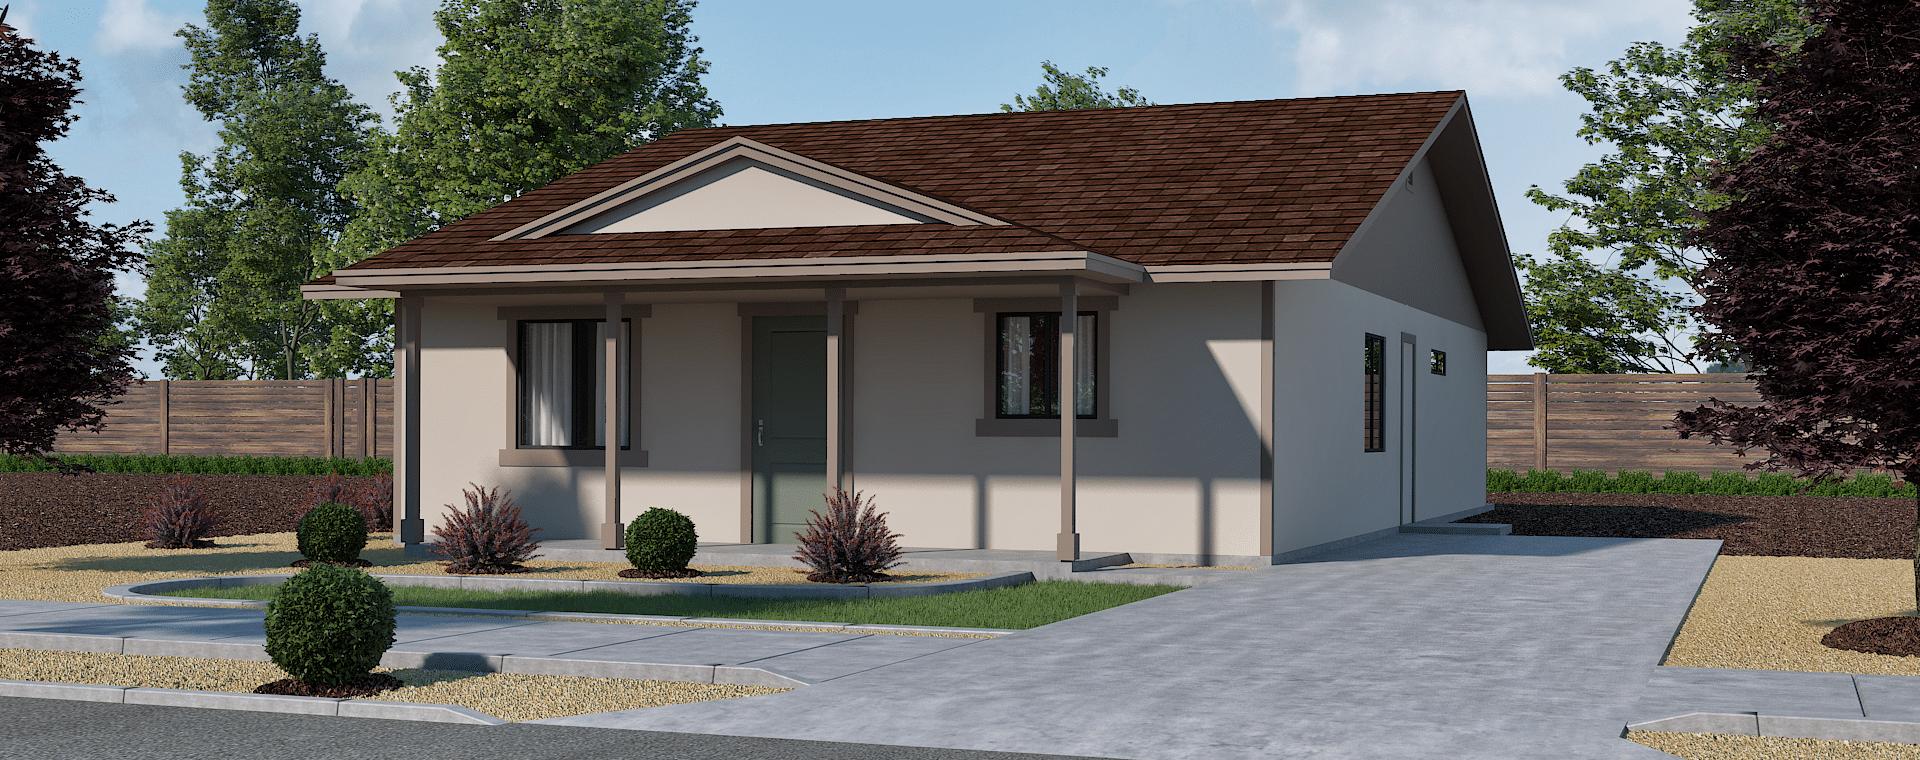 jenuane-communities-new-homes-nv-flats-plan-2-1260